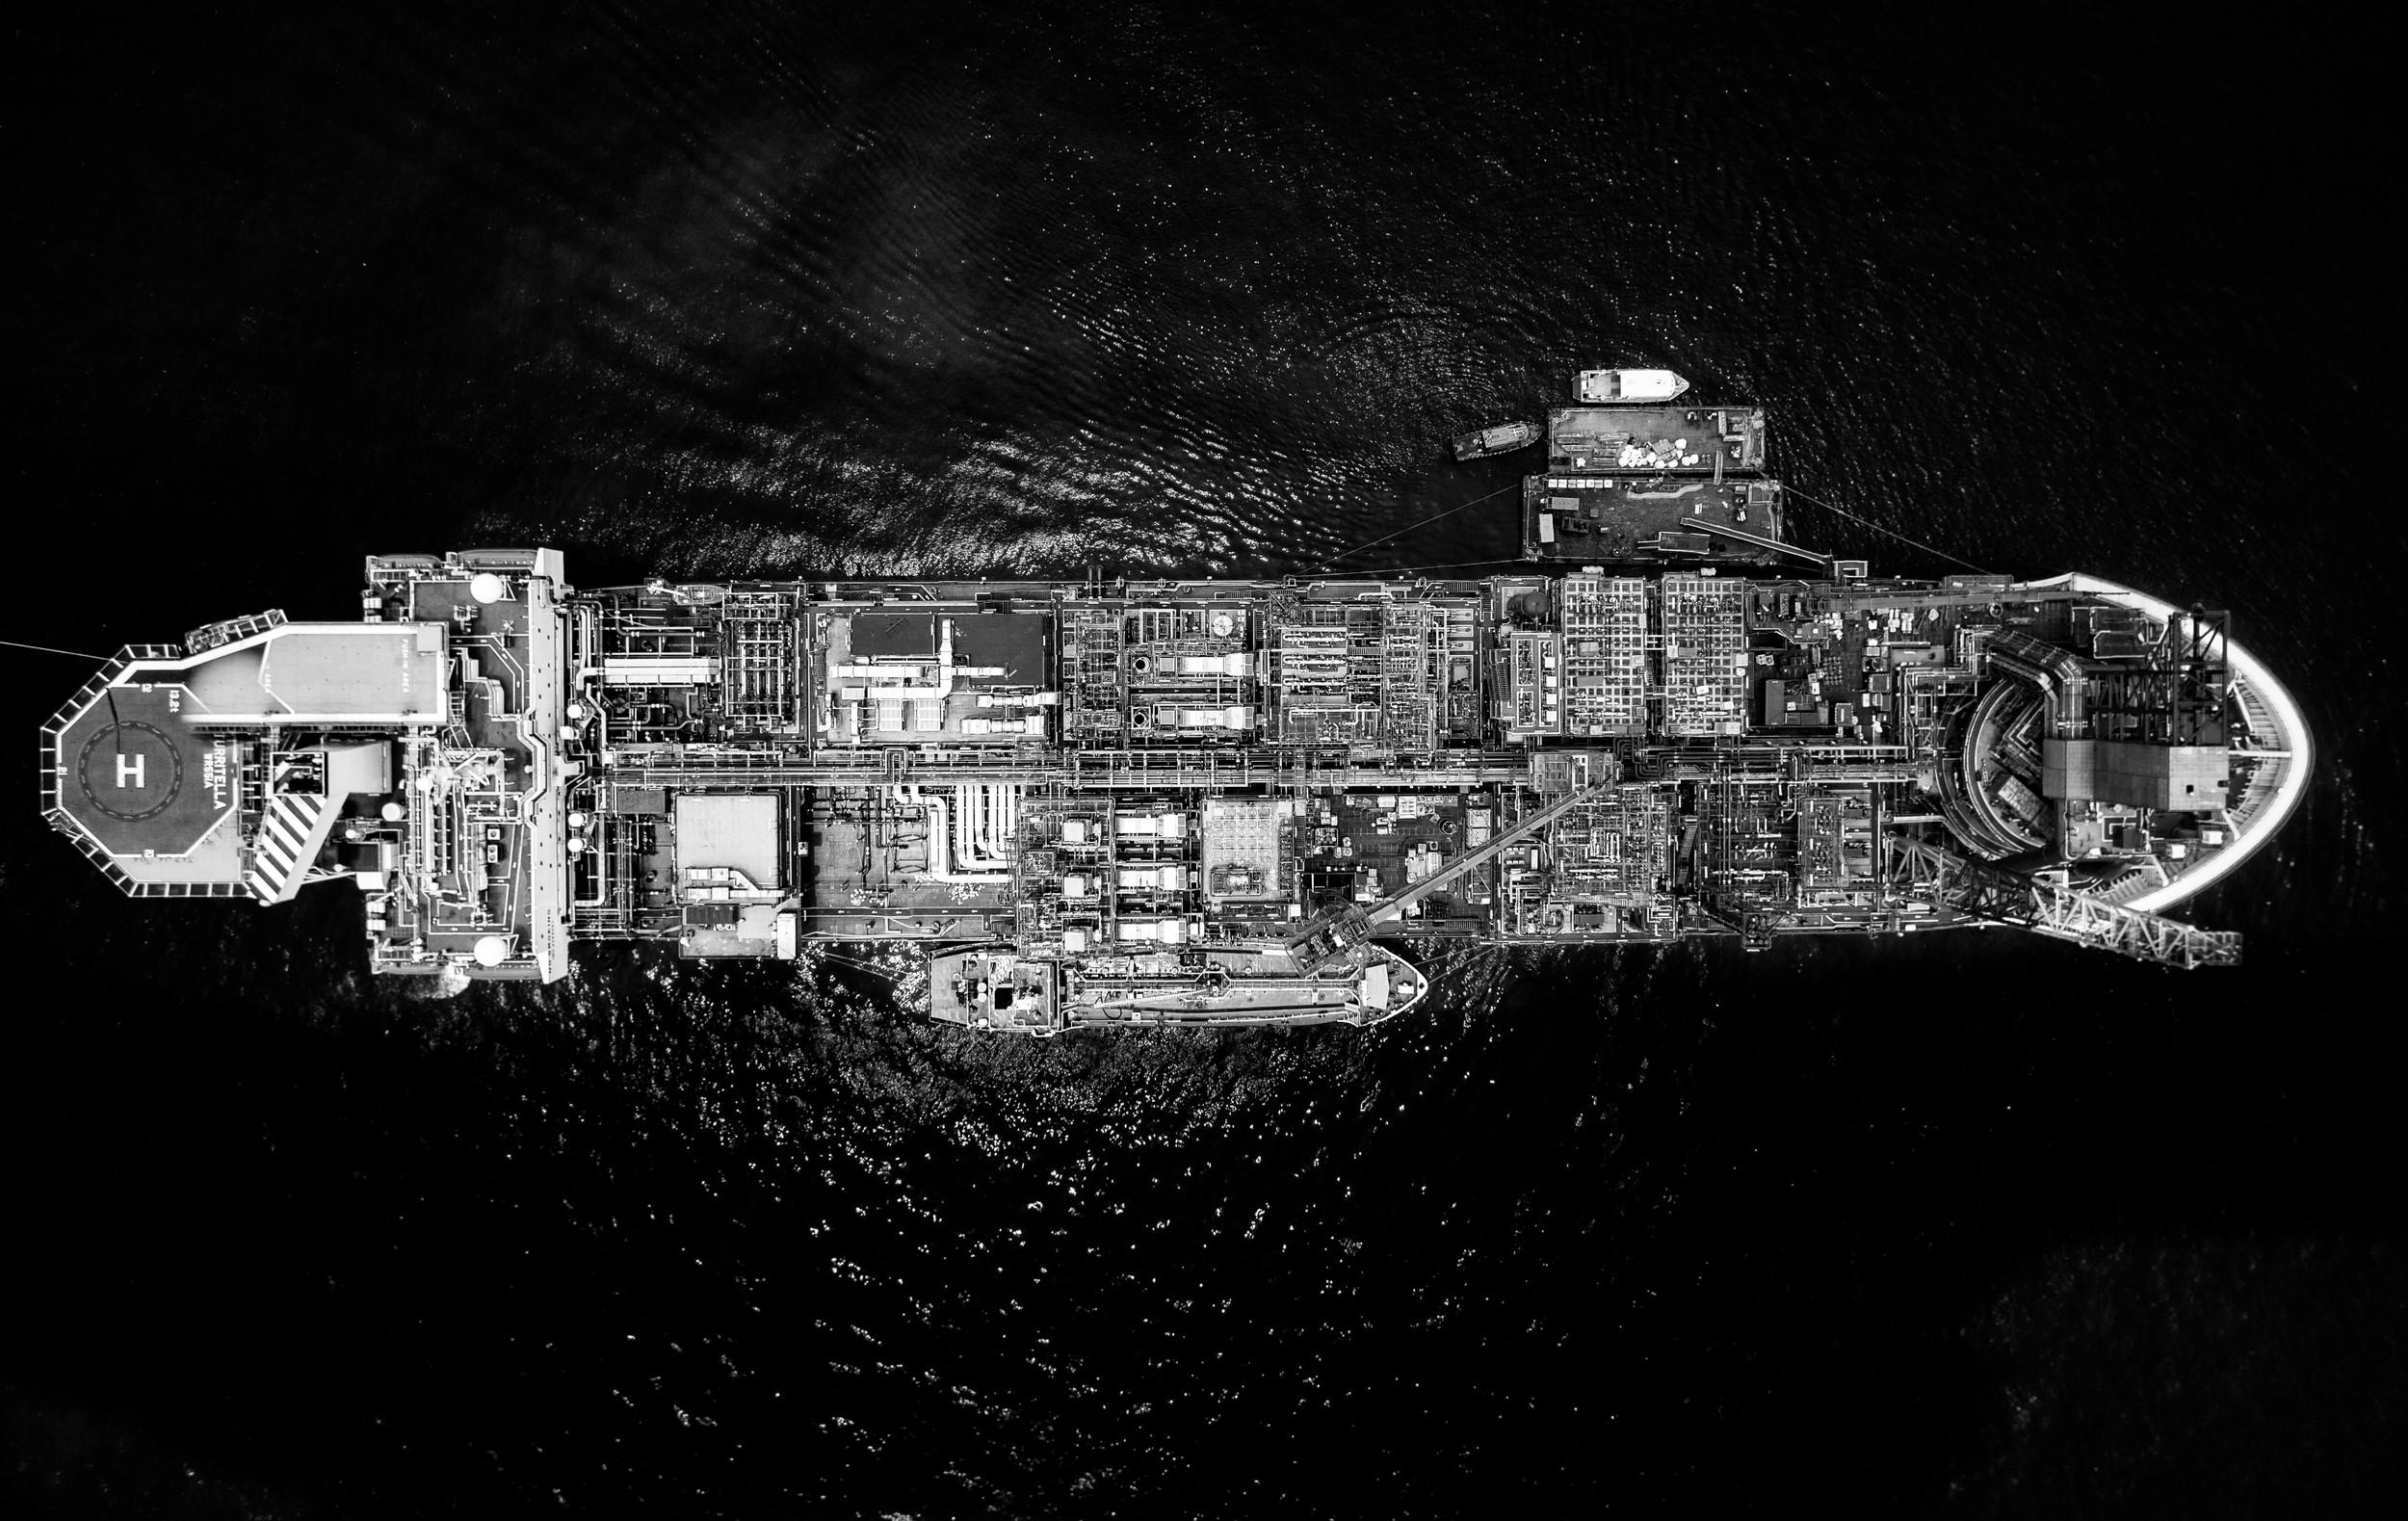 Turritella Anchorage Aerial-69.JPG